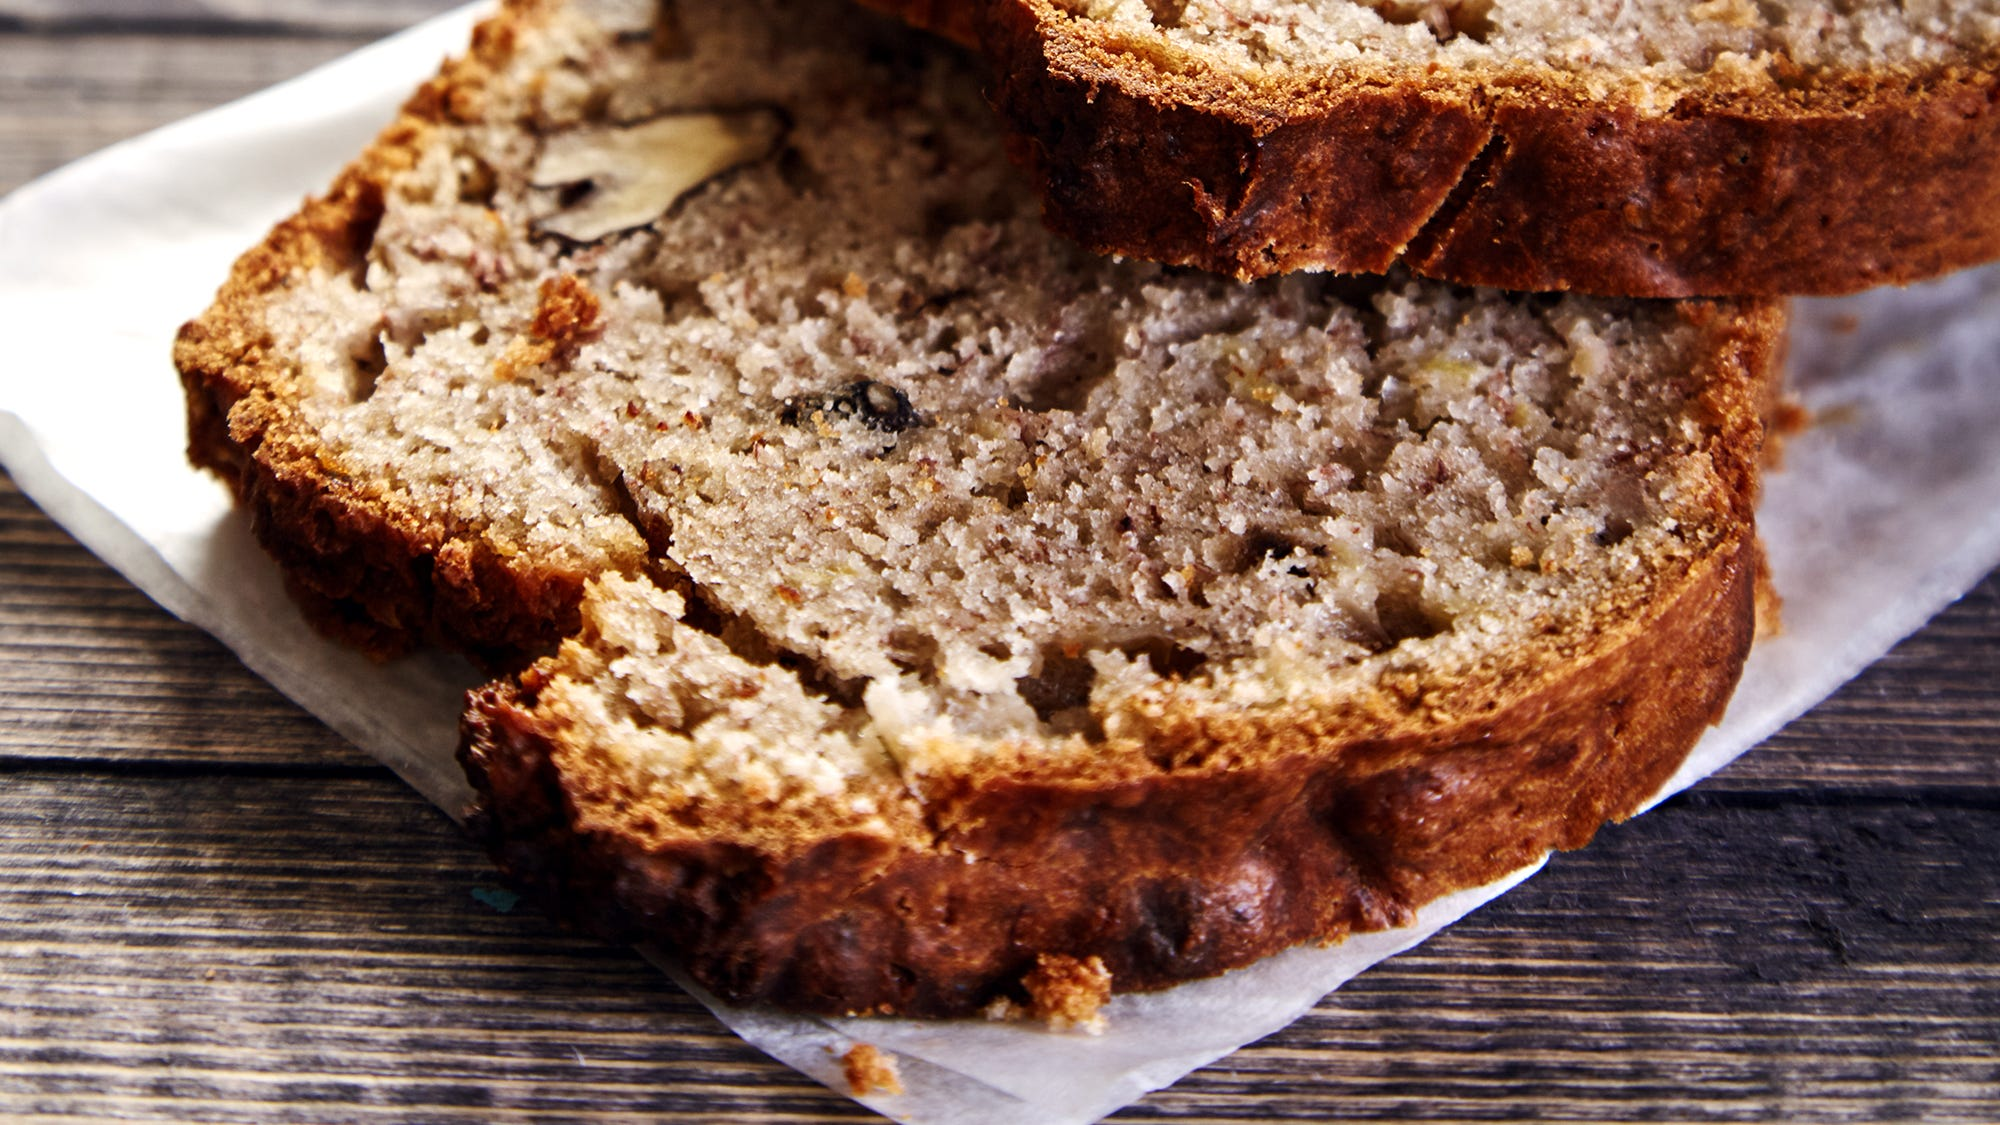 Celeb chef banana bread recipes ree drummond ina garten forumfinder Choice Image